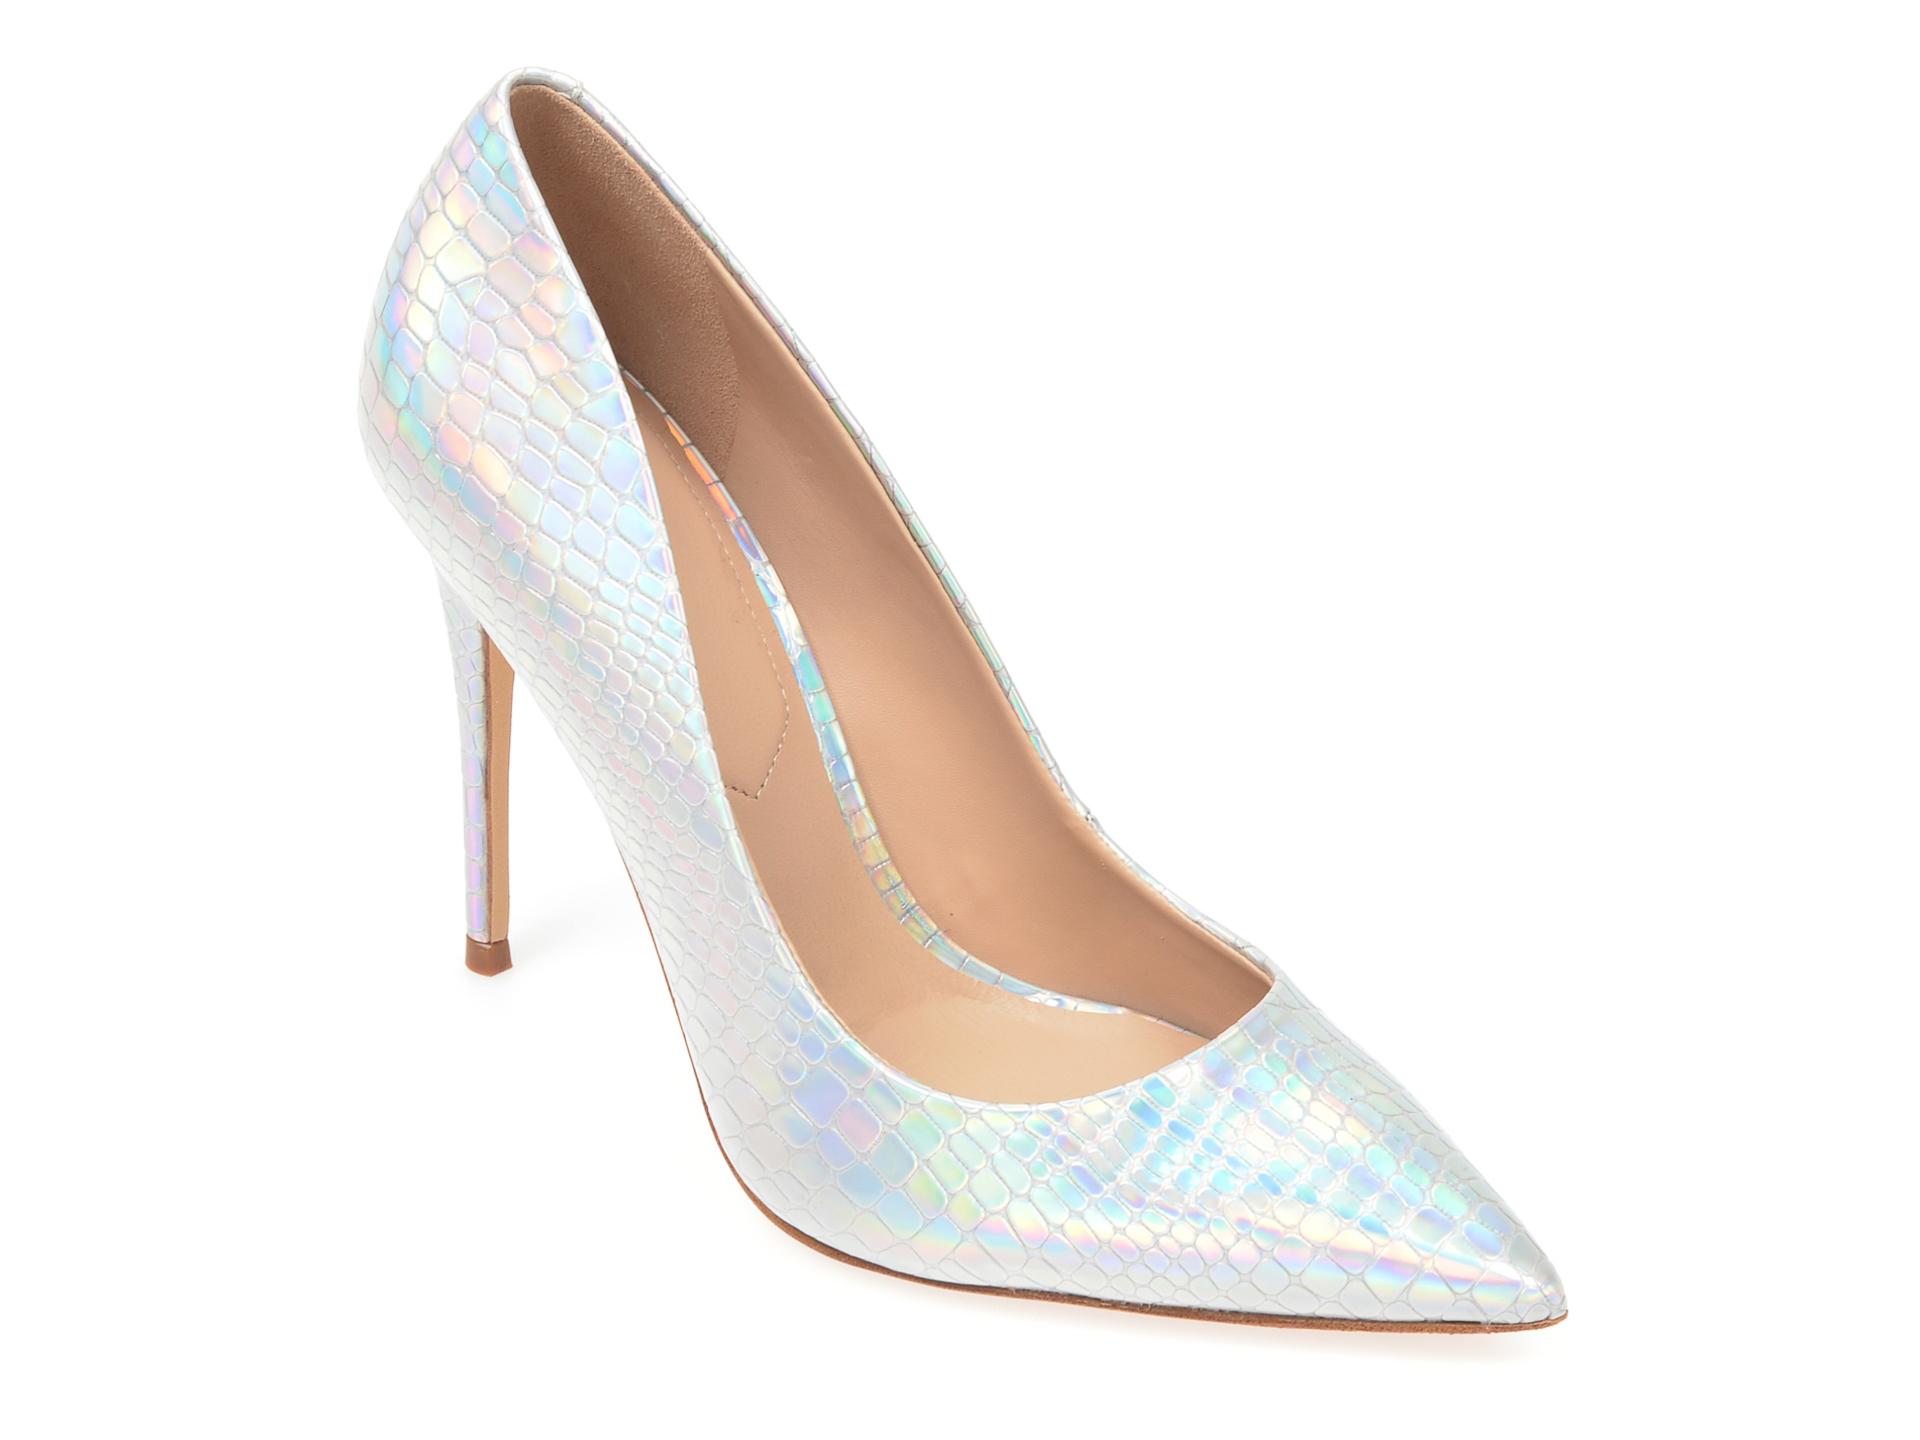 Pantofi ALDO argintii, Stessy_042, din piele ecologica imagine otter.ro